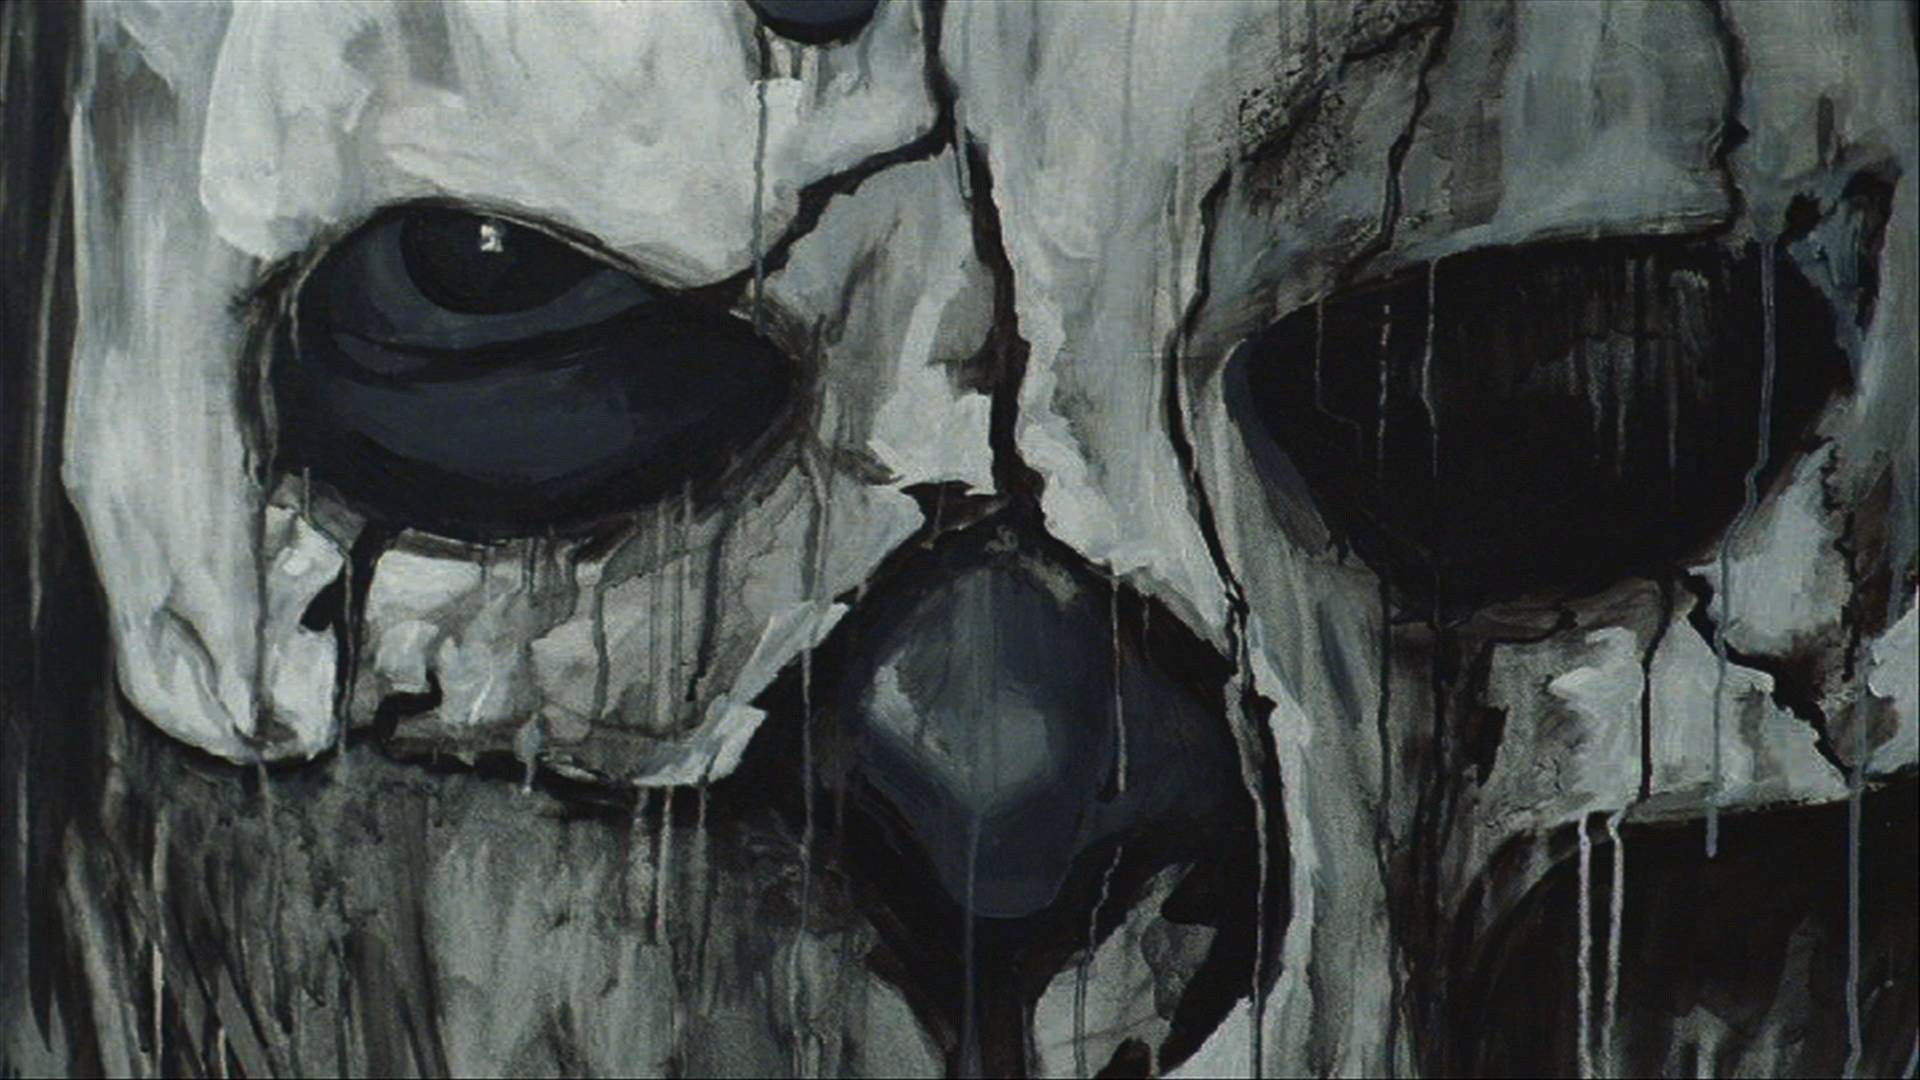 Dark skull wallpapers 42 images - Scary skull backgrounds ...